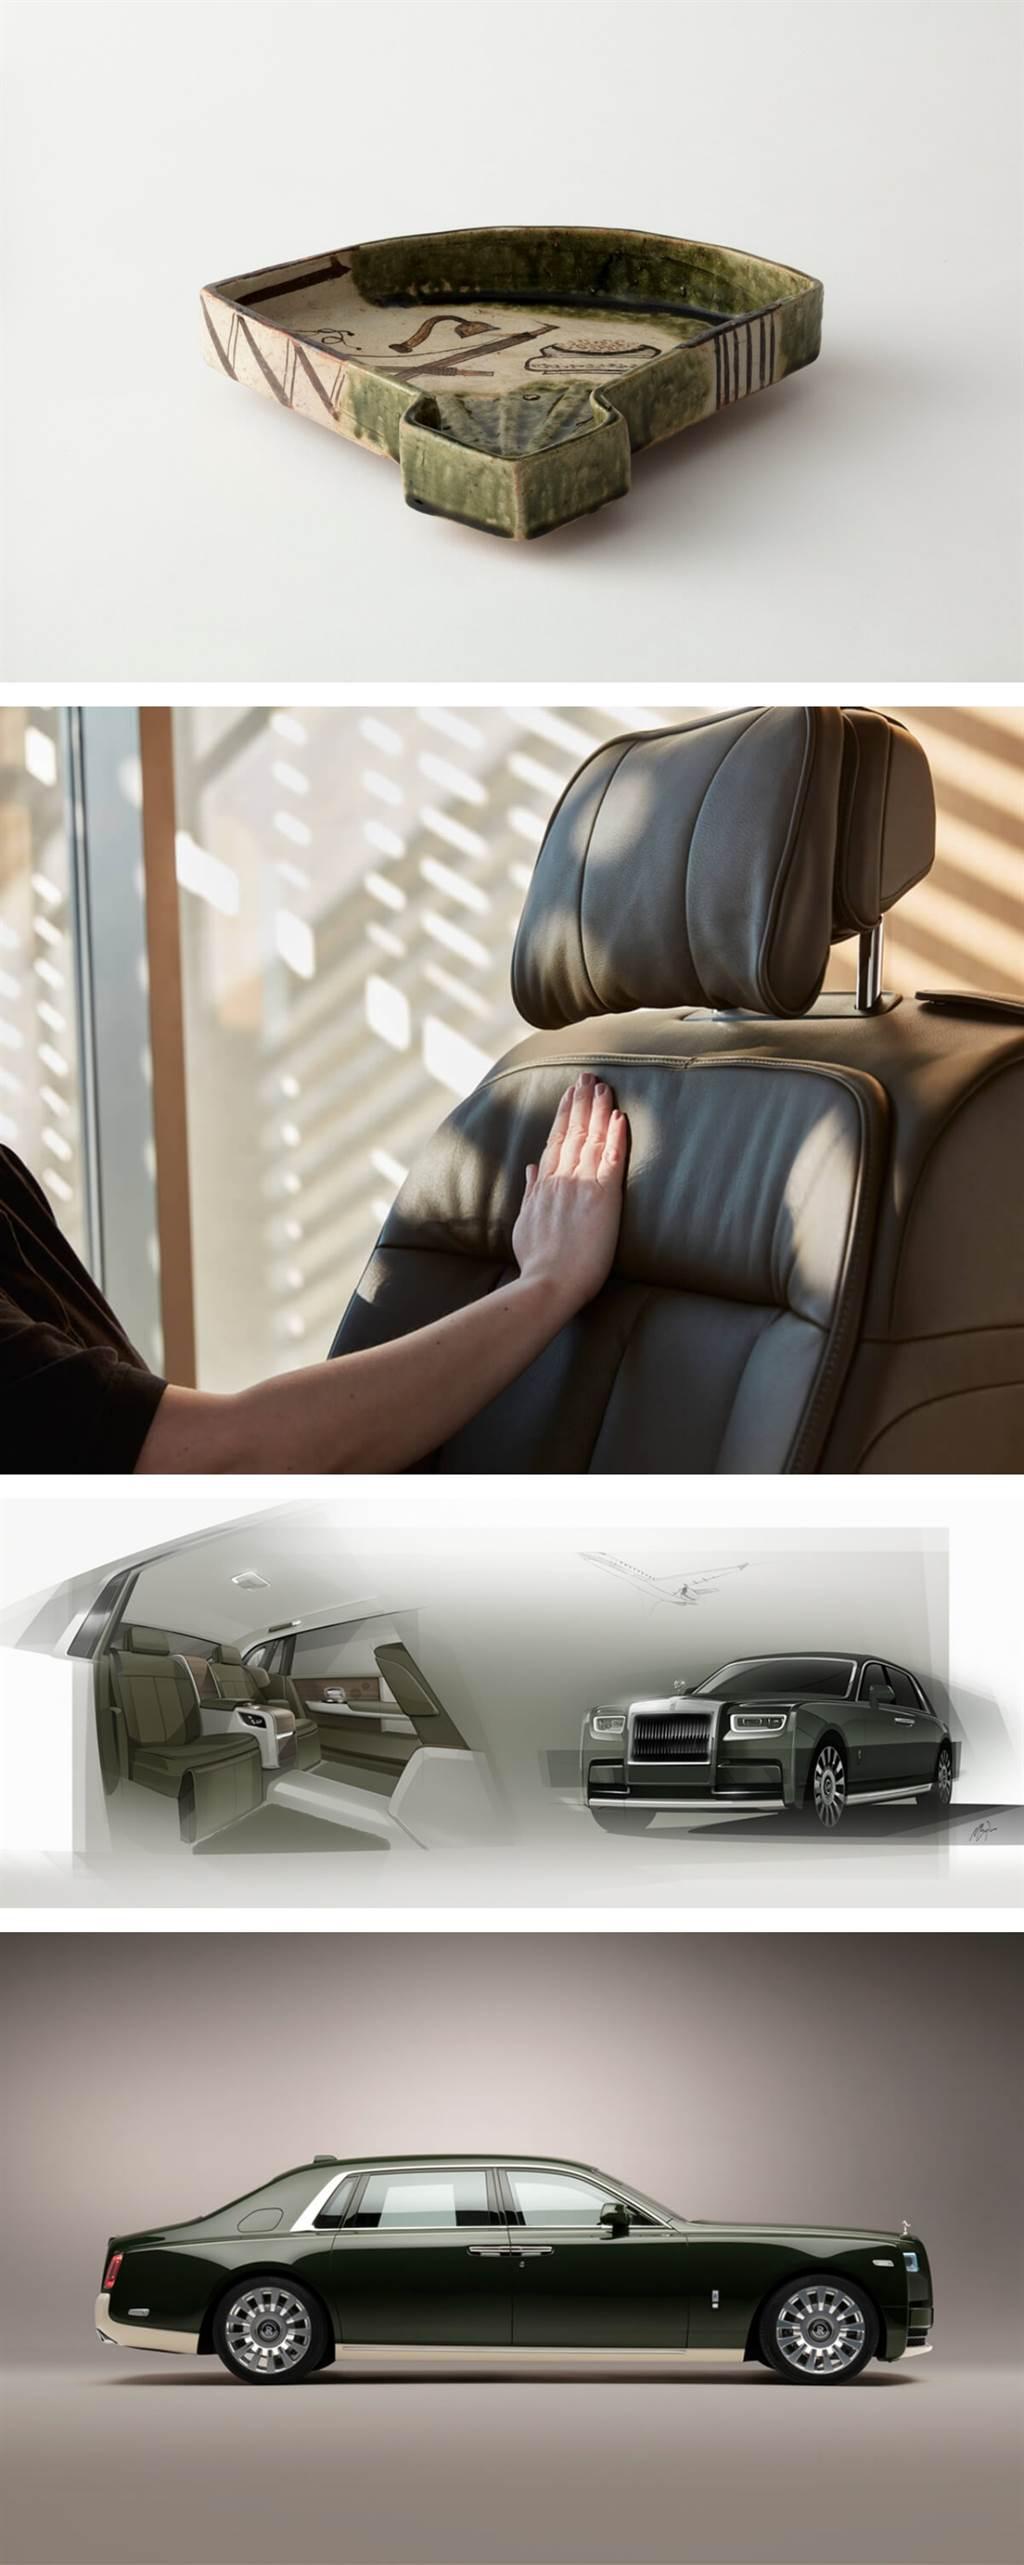 Rolls-Royce與愛馬仕合作推出聯名定制Phantom Oribe